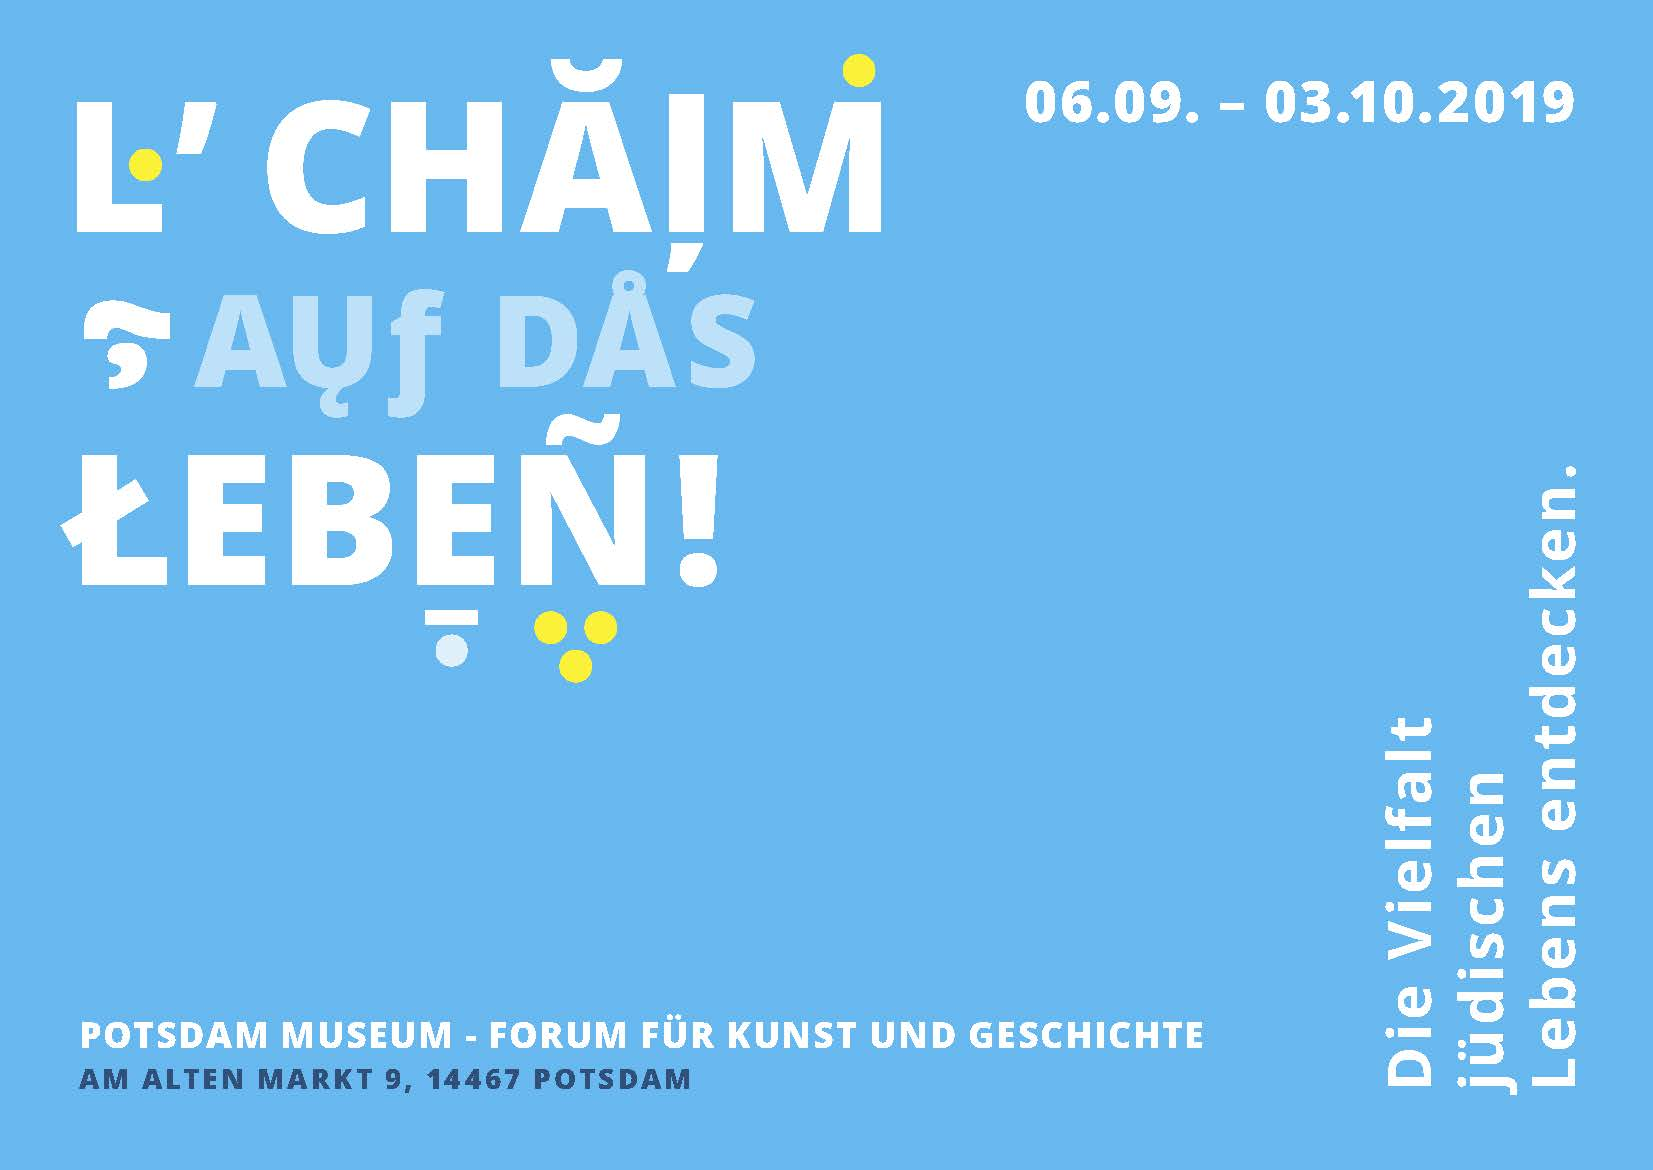 L'Chaim – Auf das Leben im Potsdam Museum 6.09. - 03.10. 2019